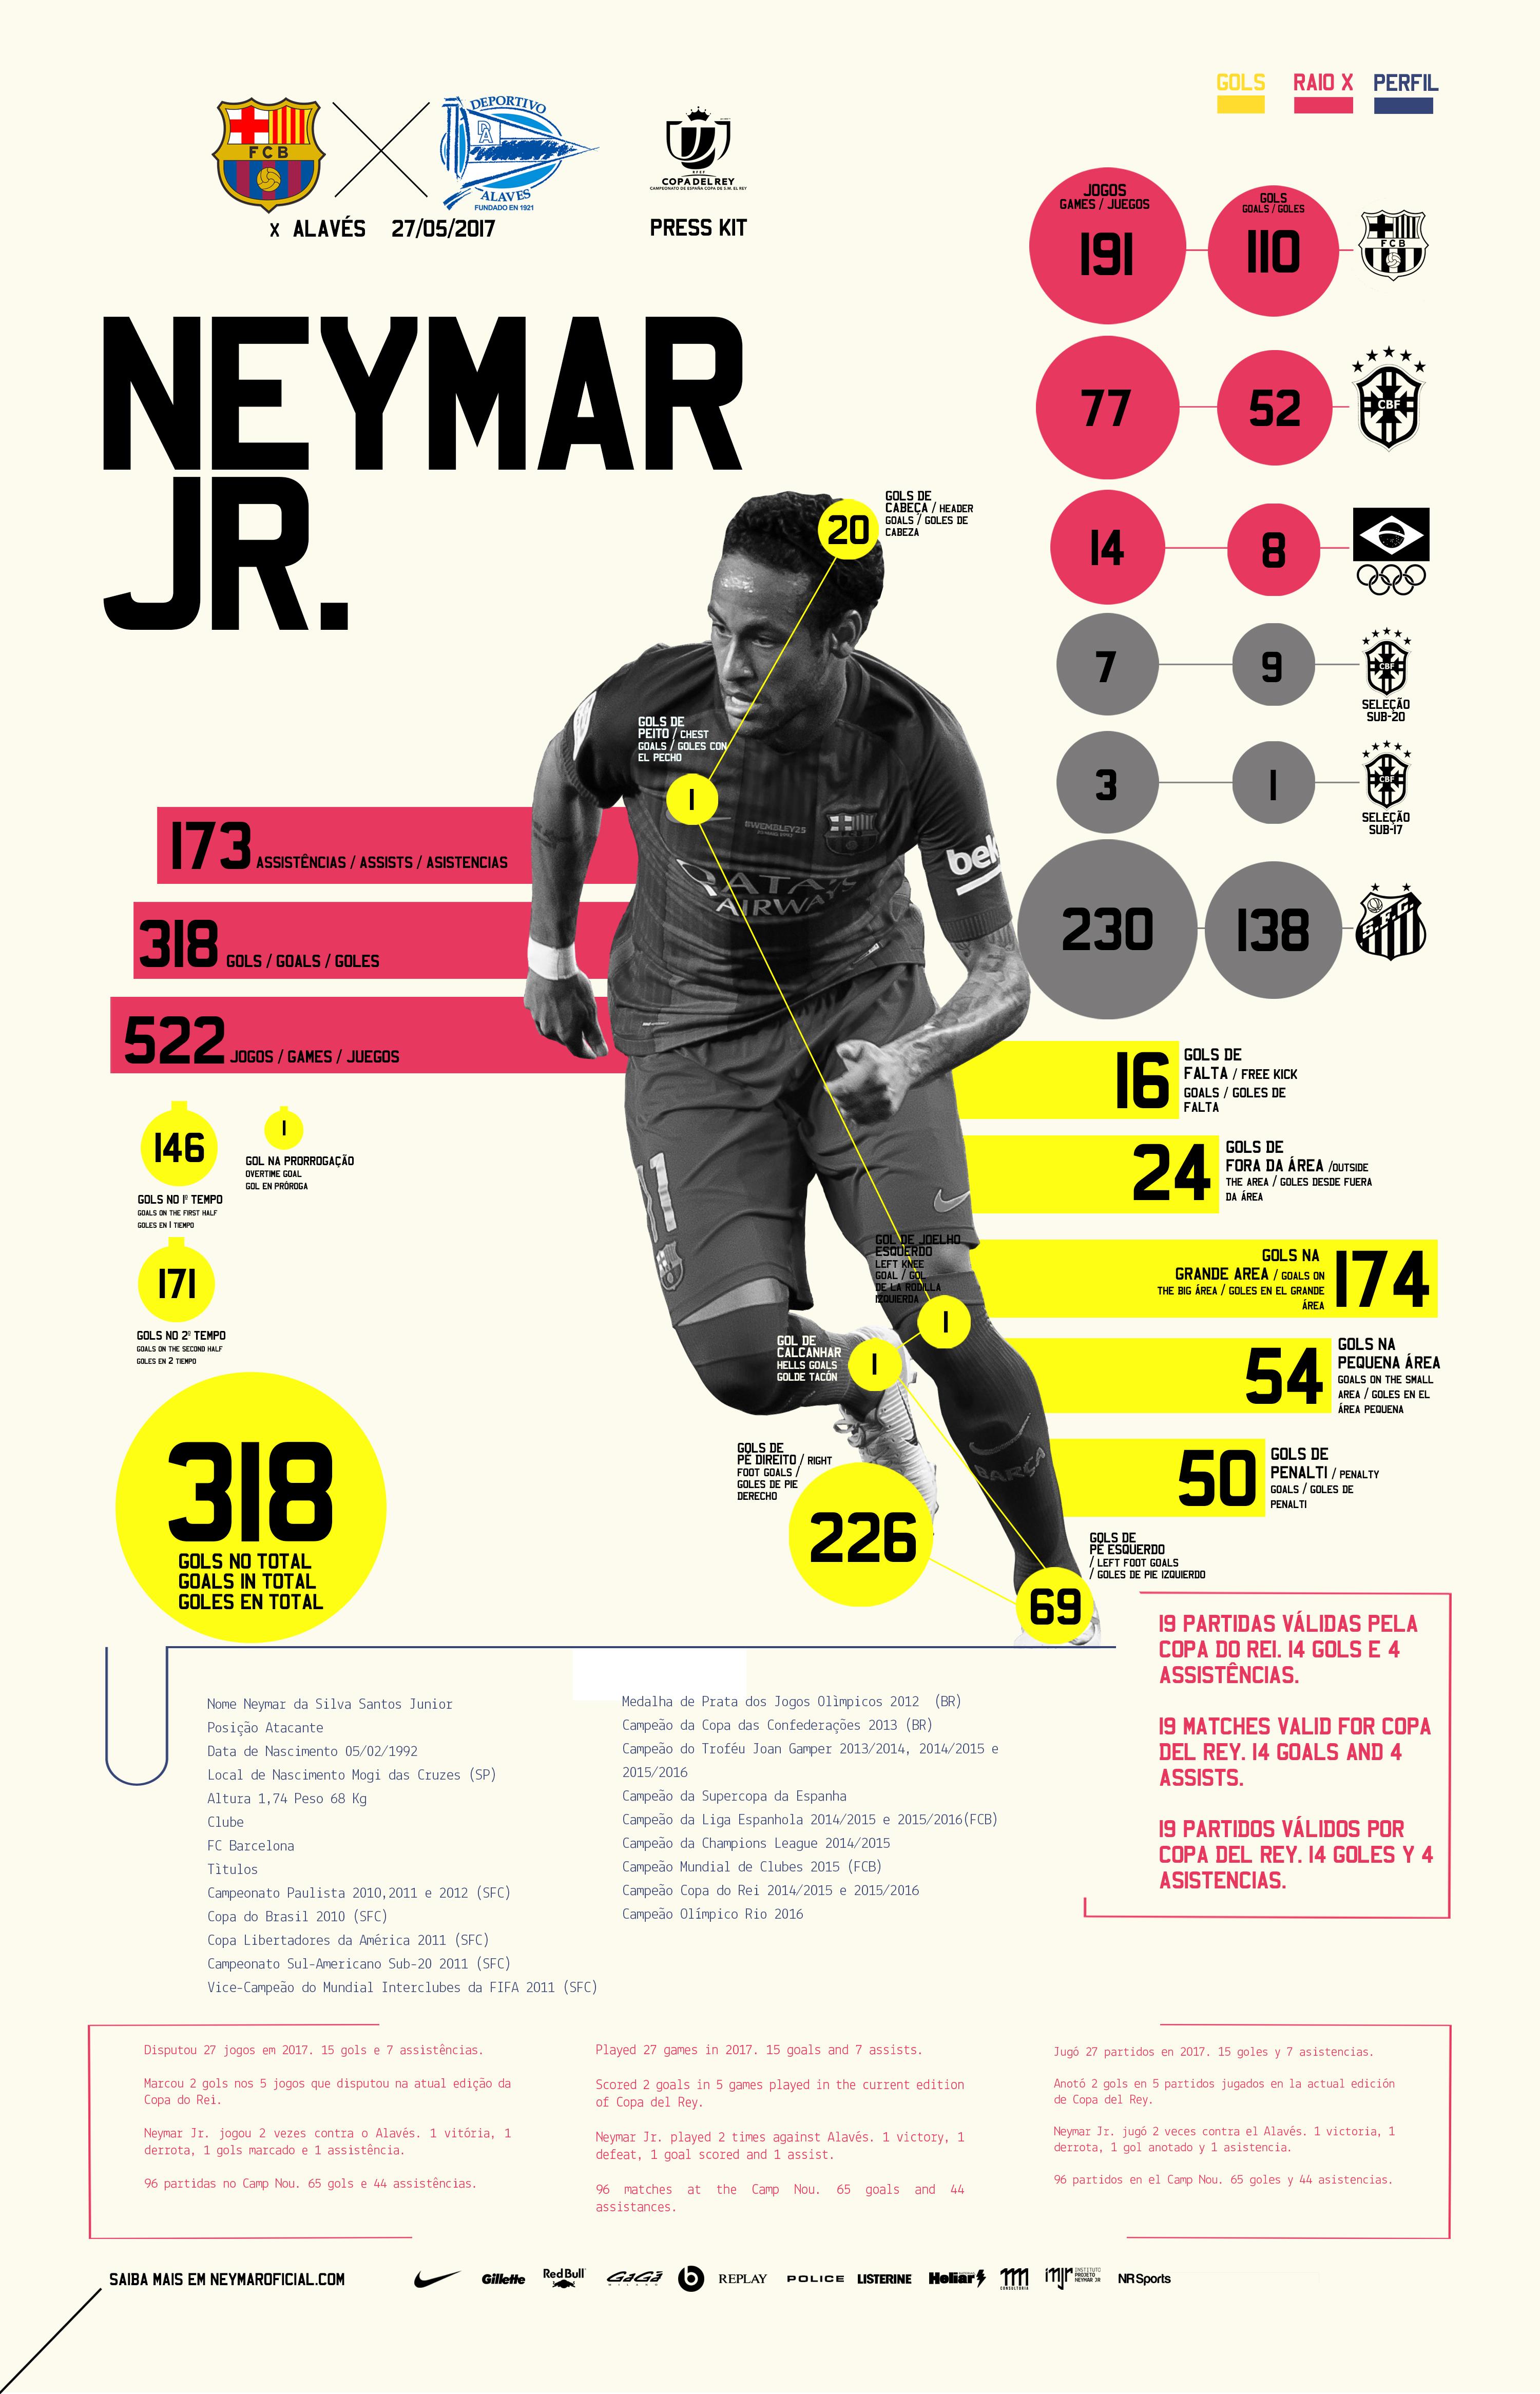 ba68407df4 Press Kit - Neymar Jr - FC Barcelona x Alavés - Copa do Rei 16 17